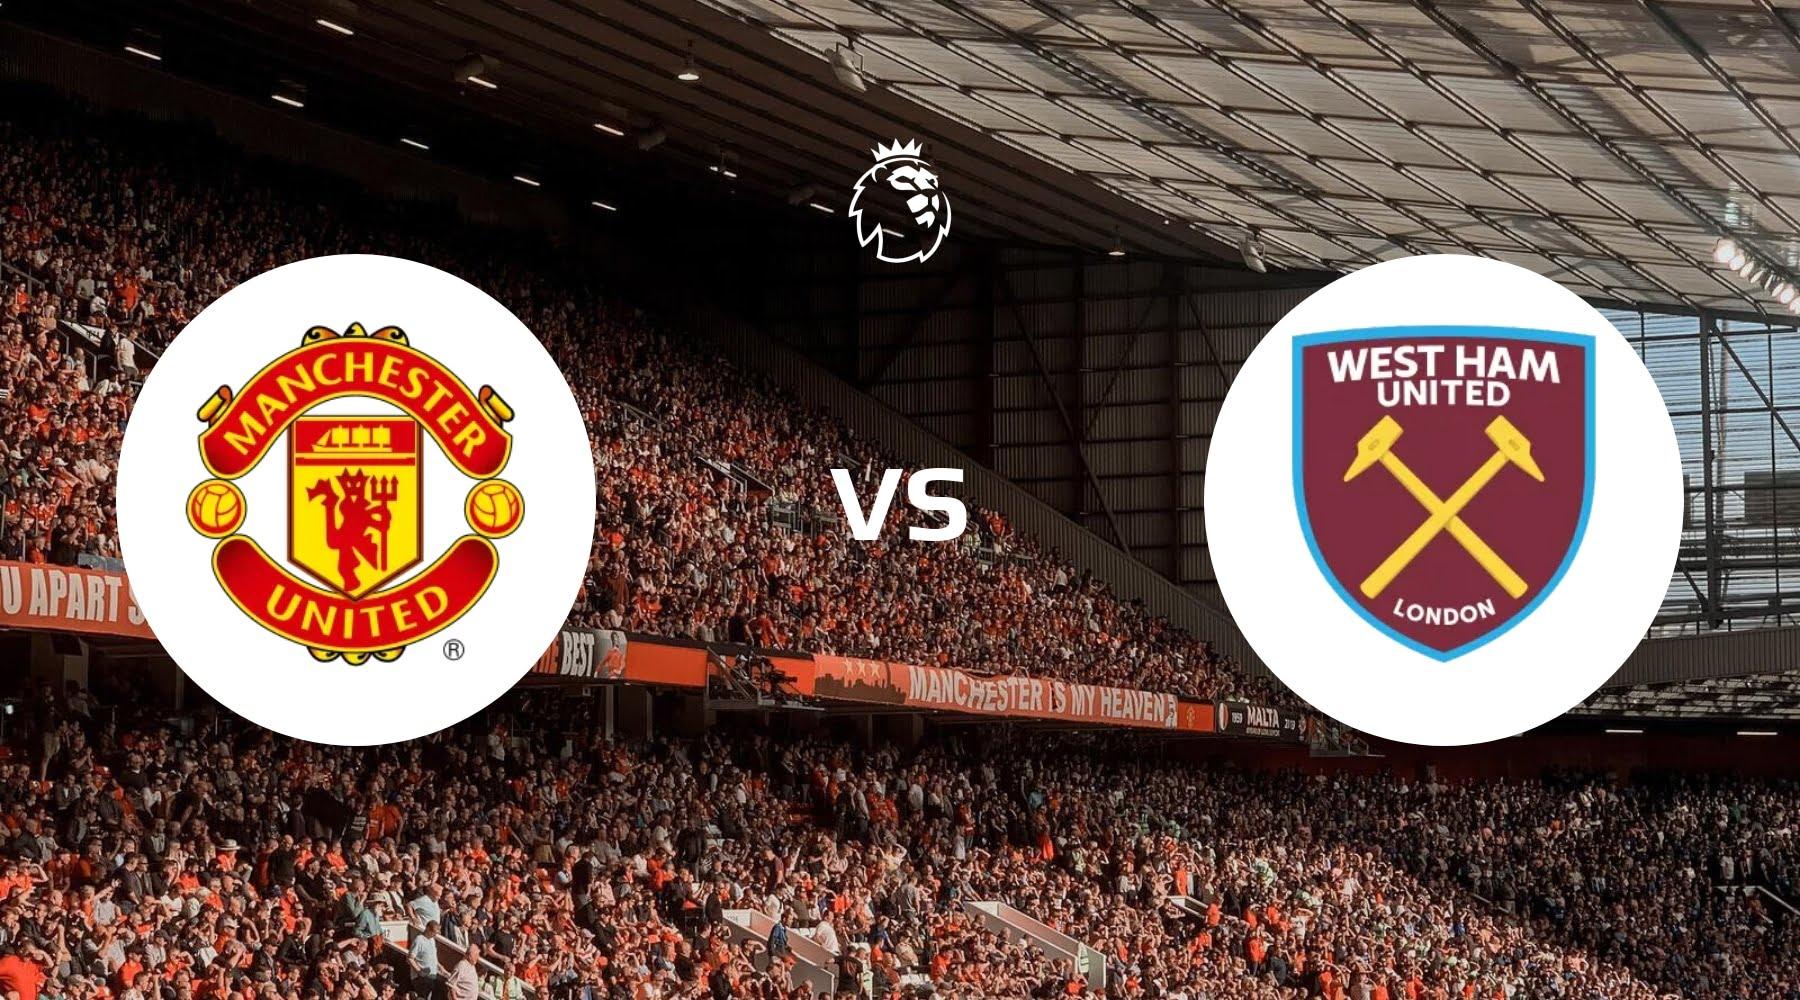 Manchester United vs West Ham United Betting